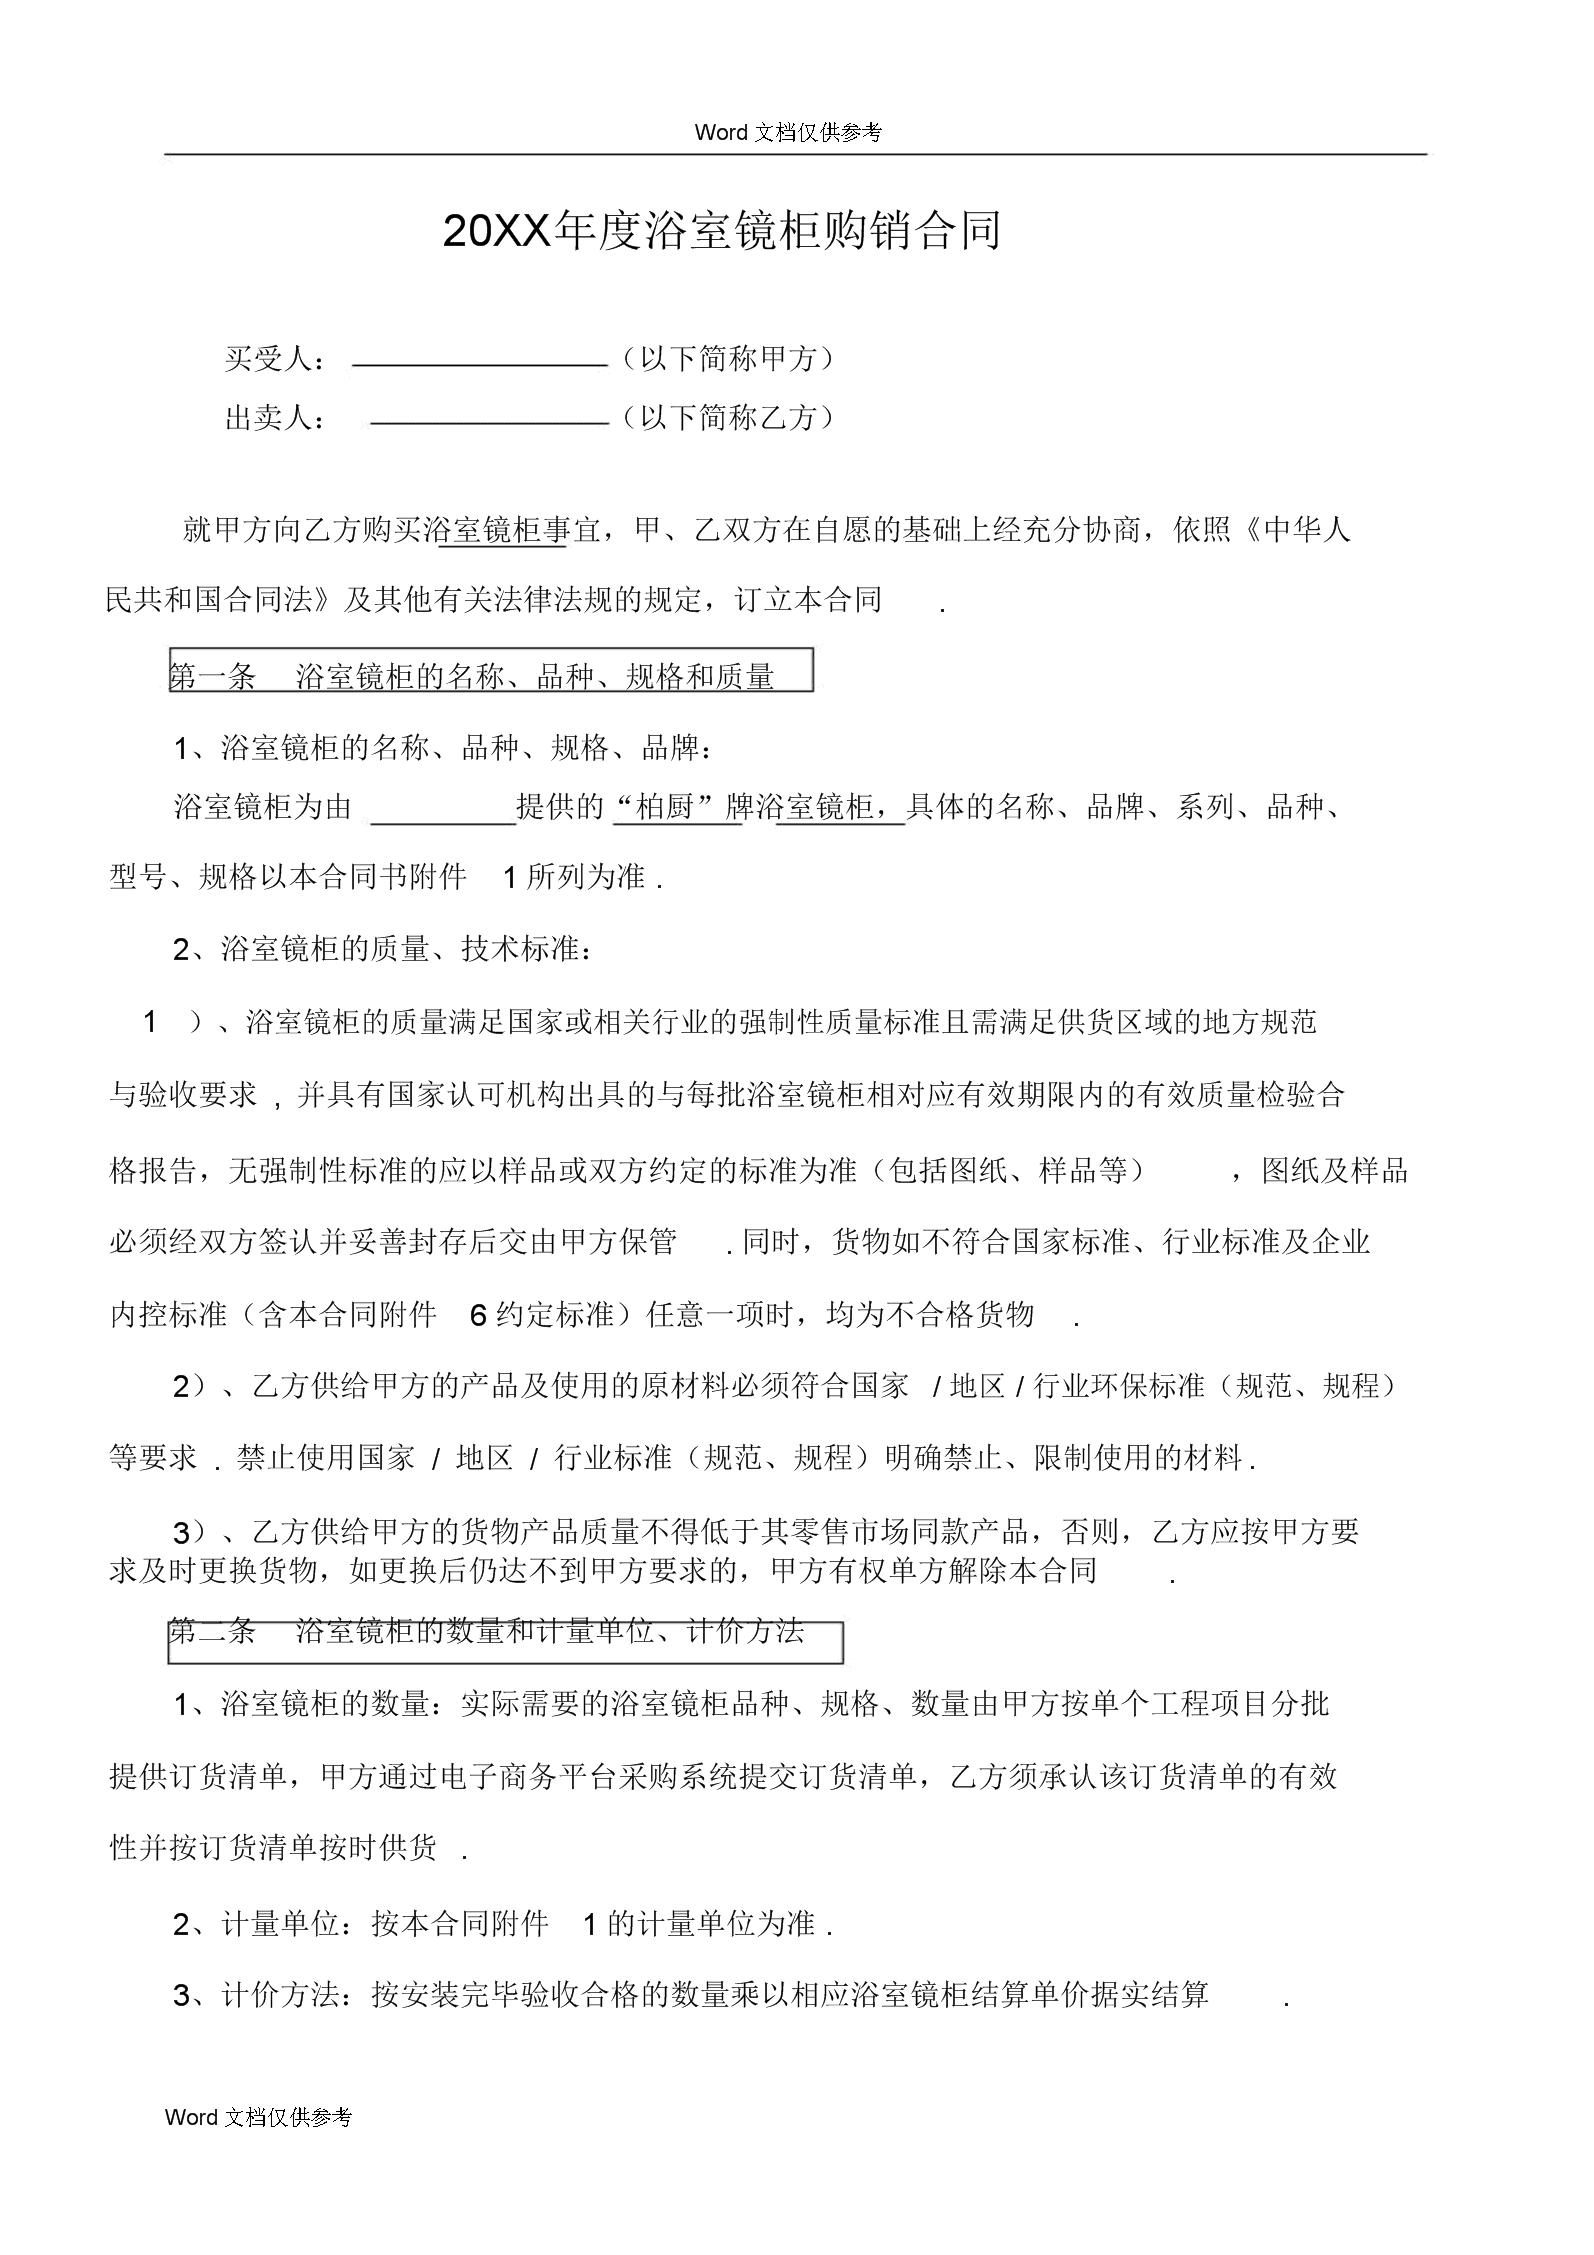 20xx年度浴室镜柜购销合同.模板参考.doc